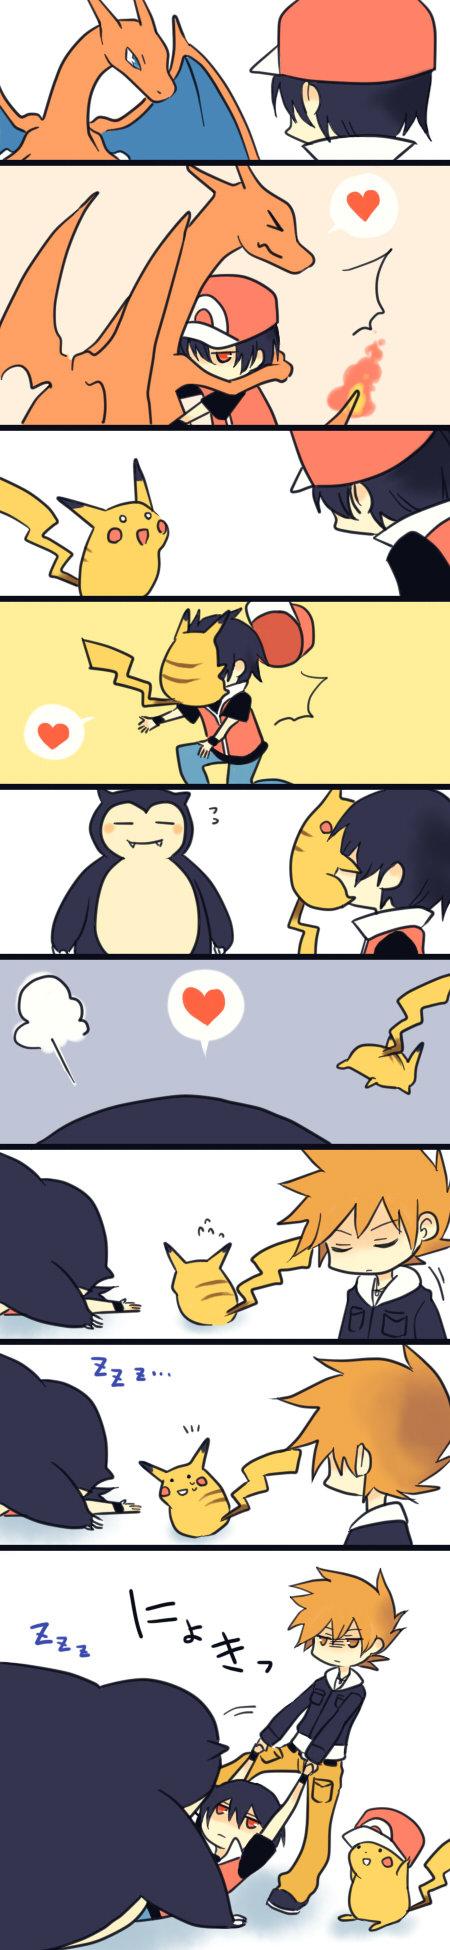 pokemon comic. :I.. So random yet so cute.